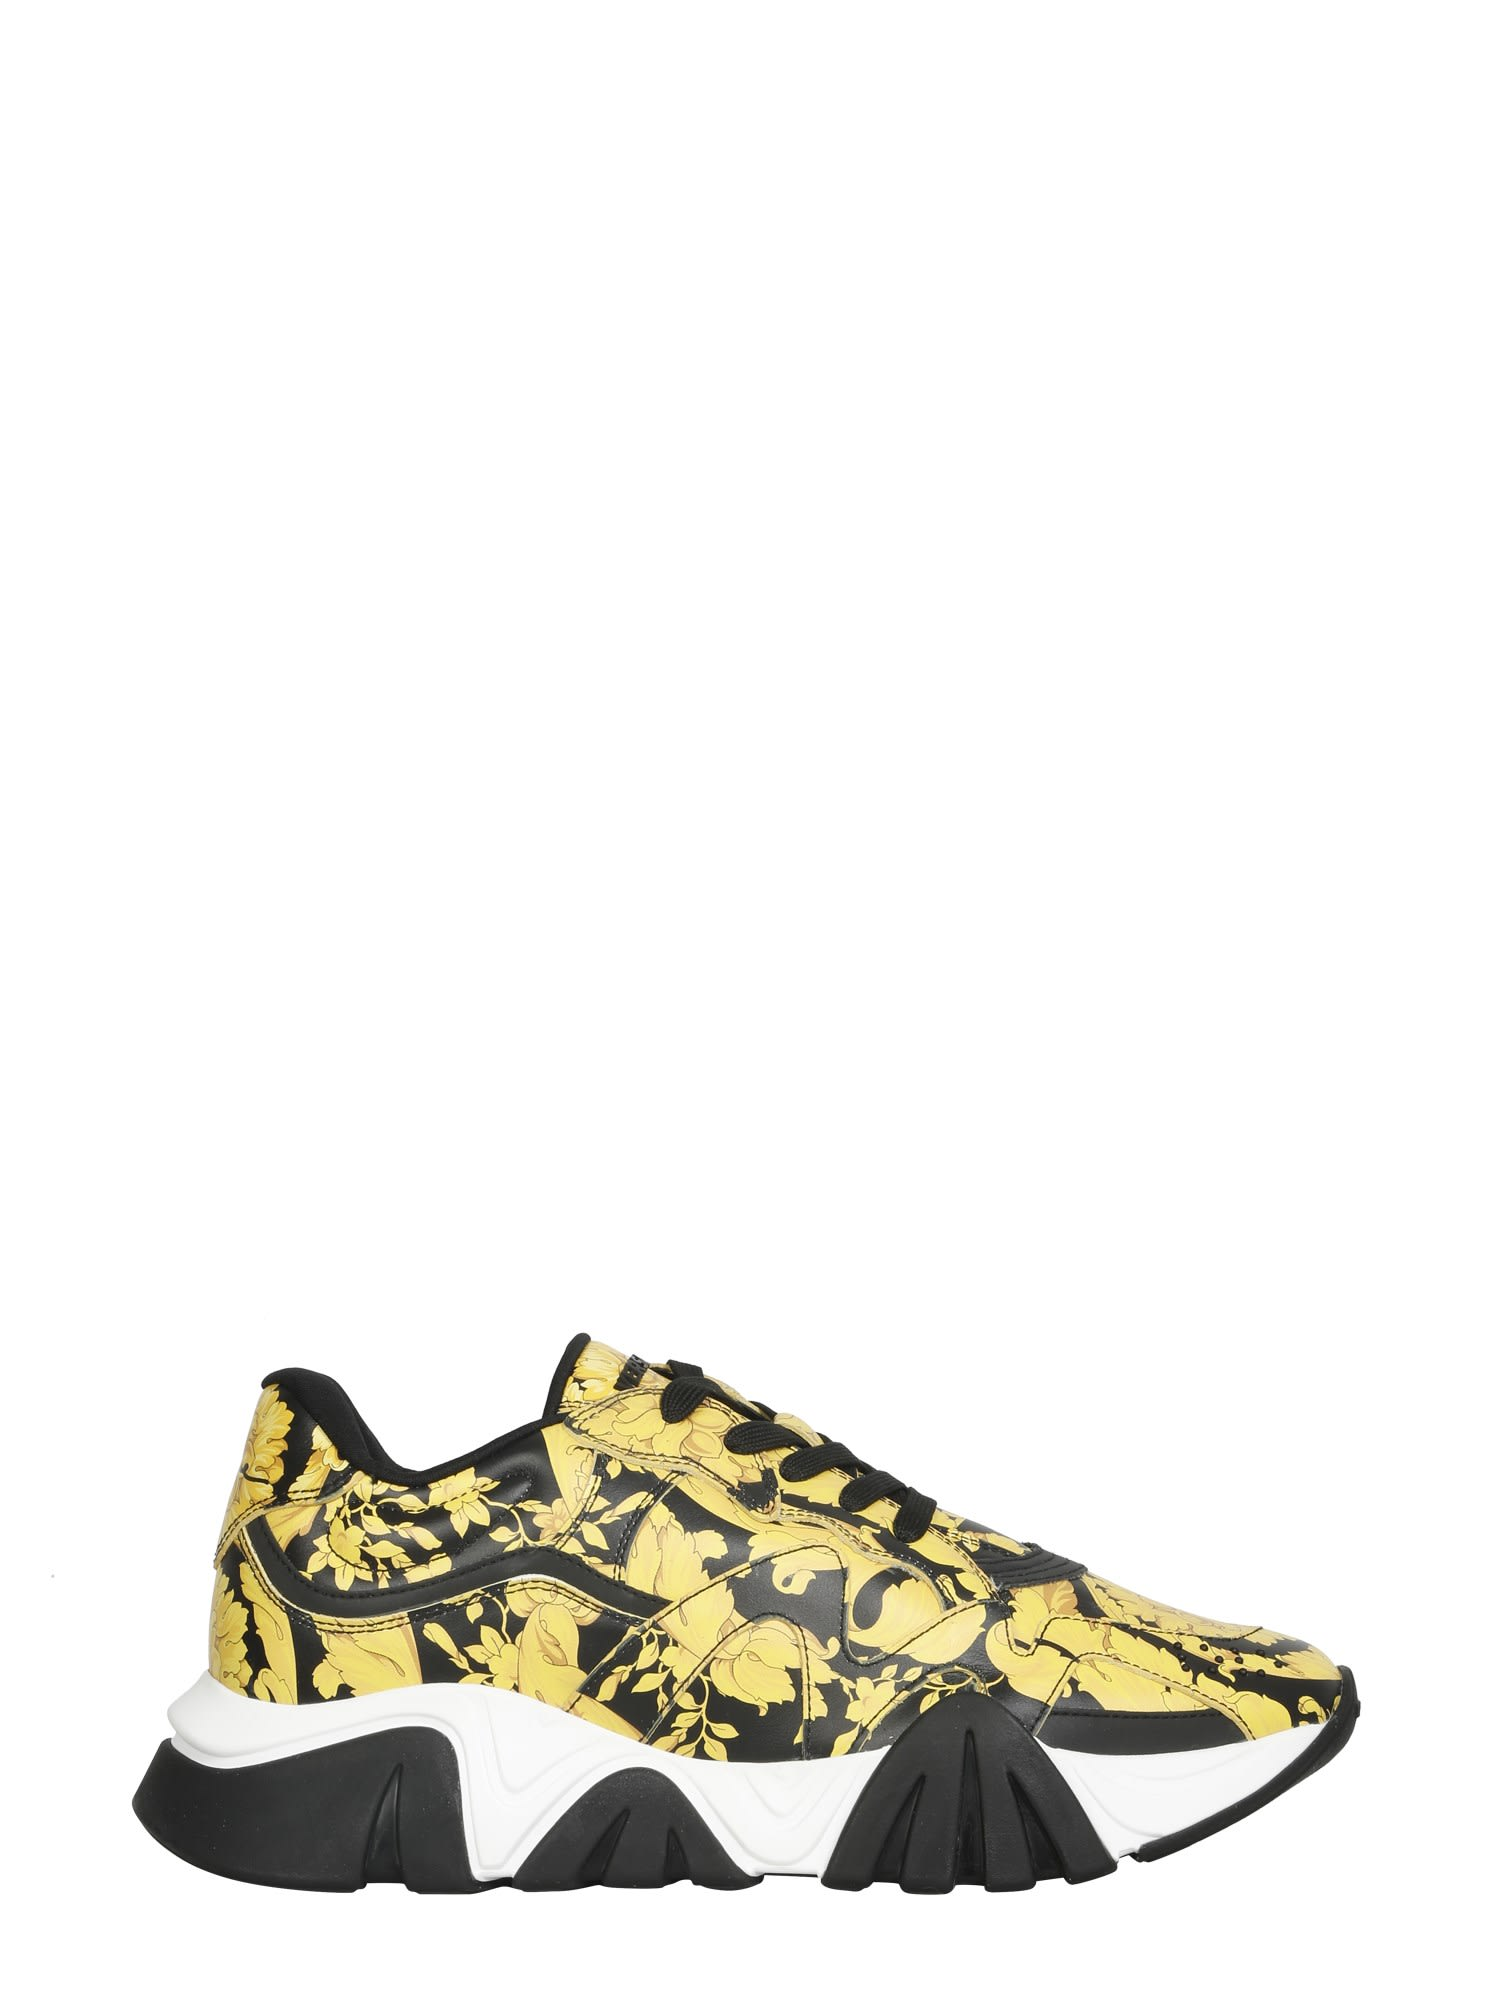 Versace Shark Sneakers In Multicolor